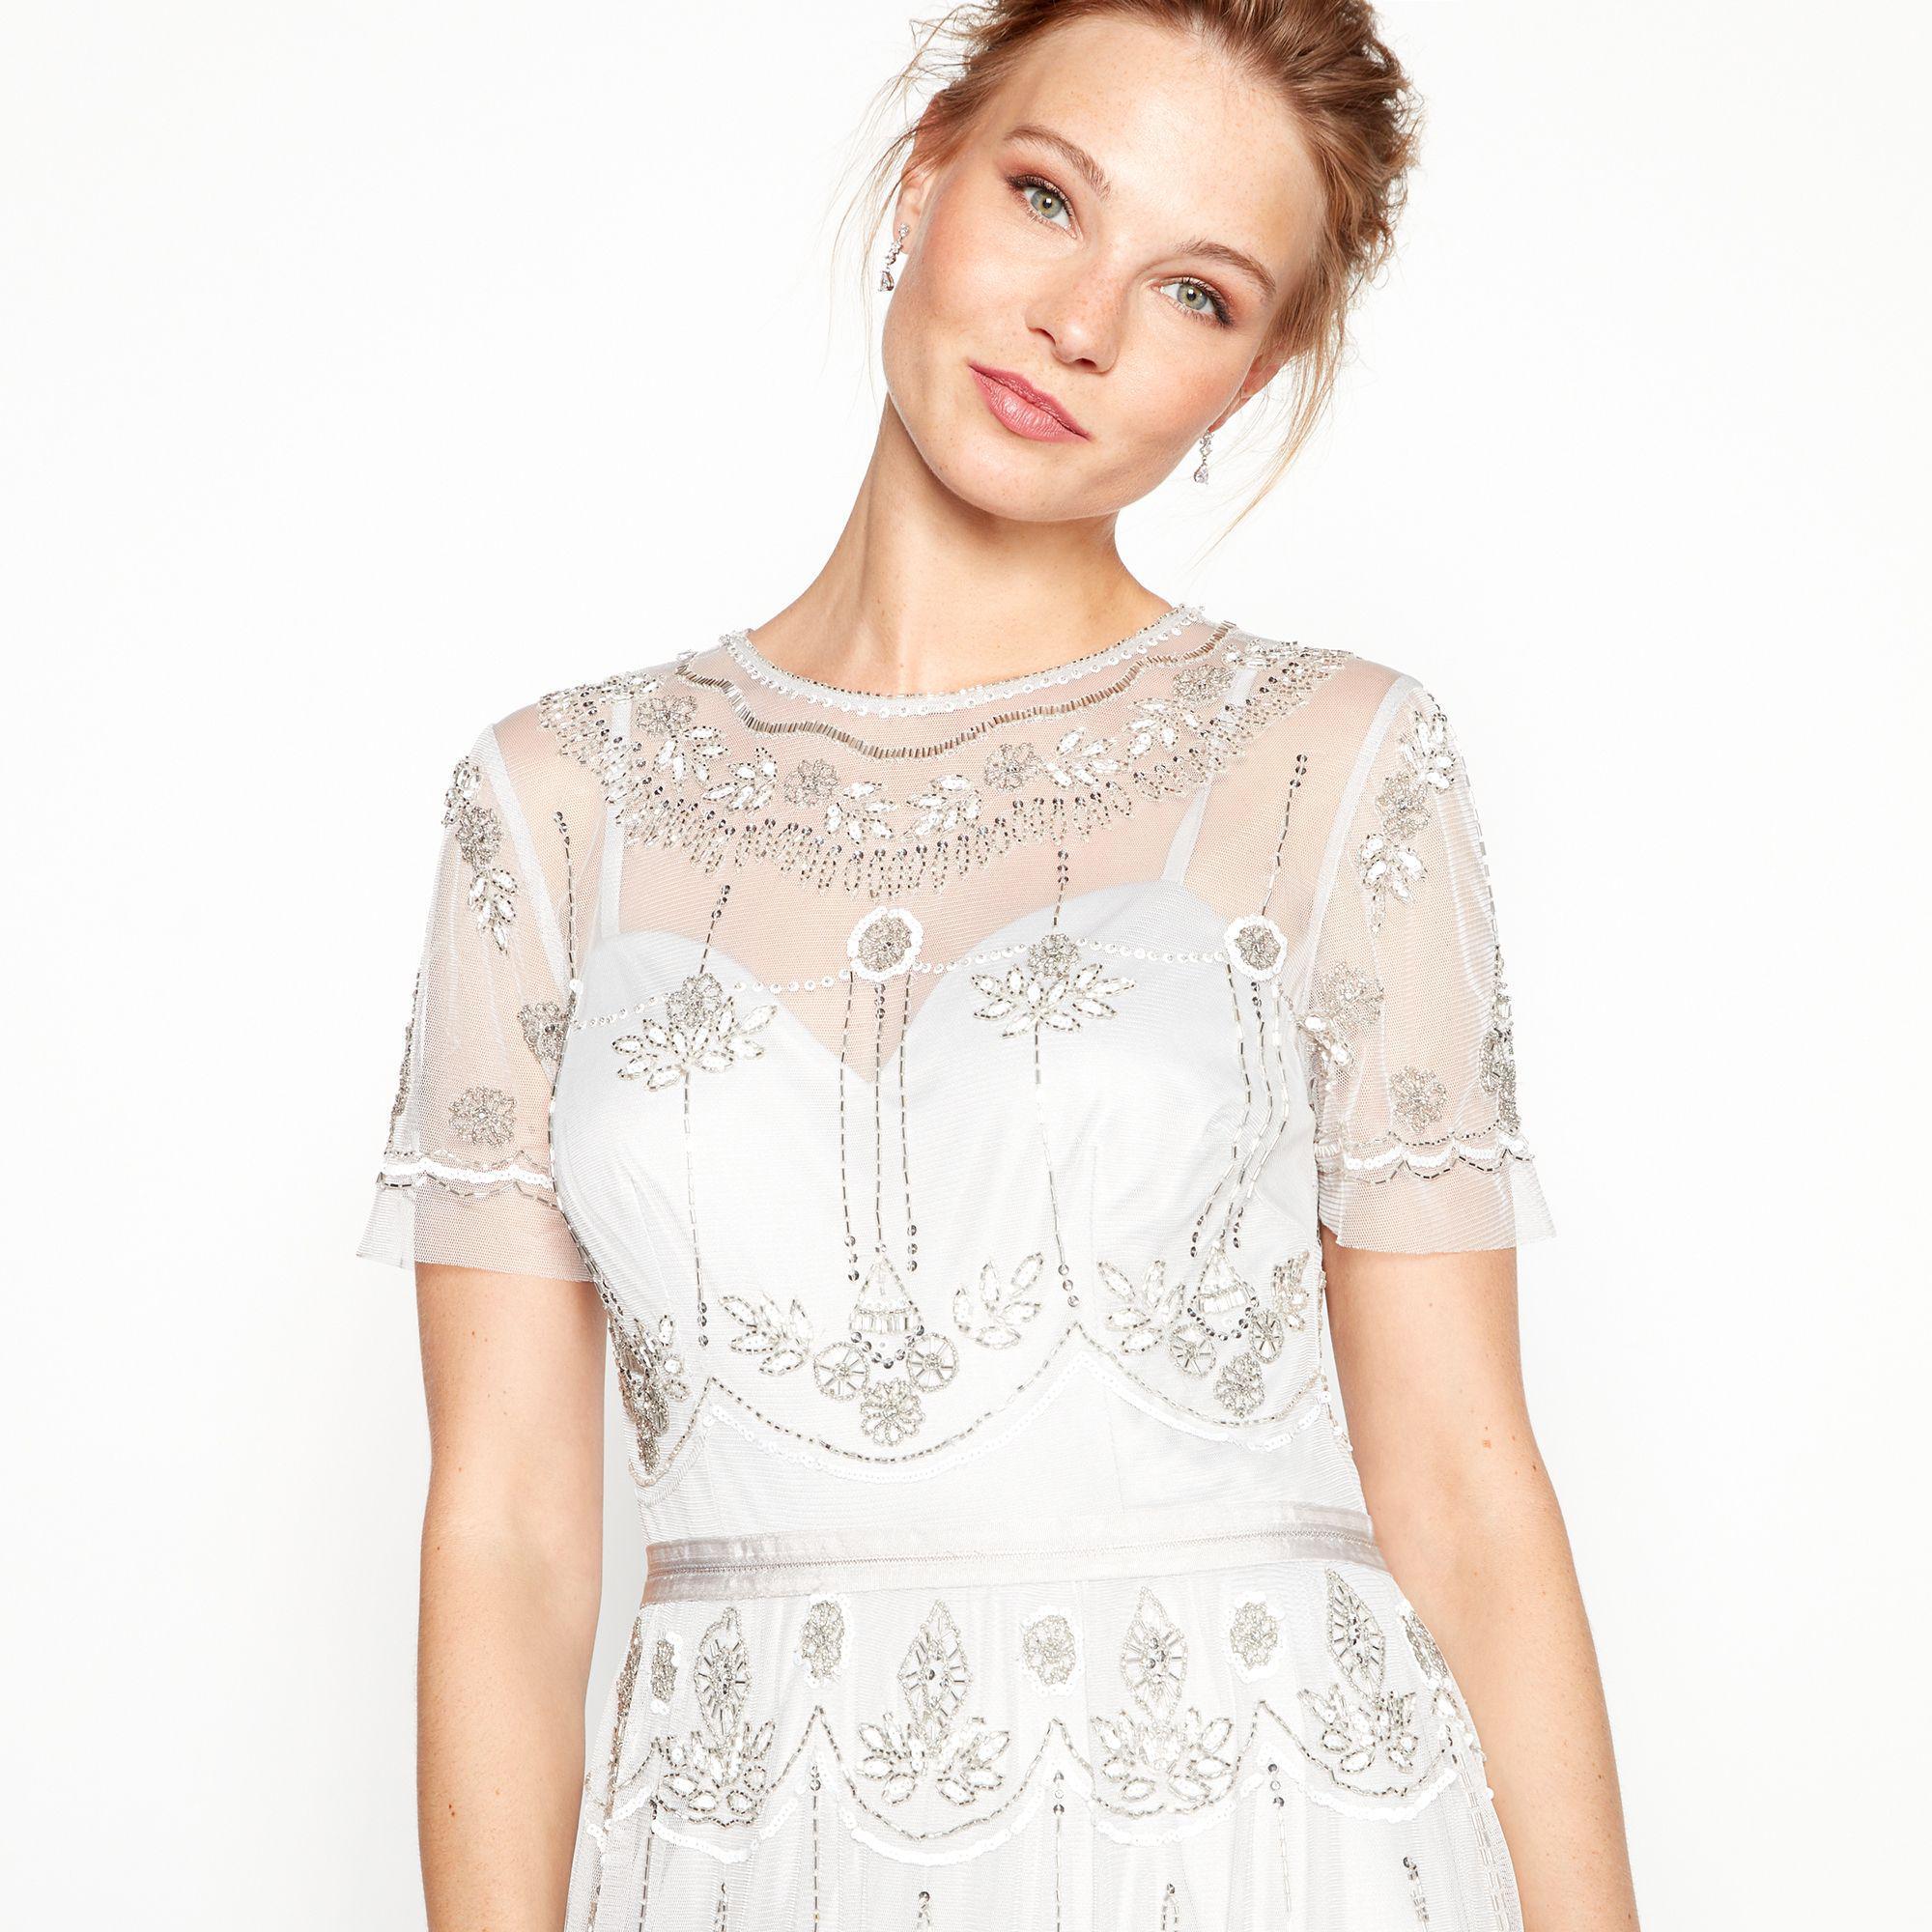 e3ea6e474ce Jenny Packham - Metallic Silver Embroidered Round Neck Short Sleeve Midi  Evening Dress - Lyst. View fullscreen